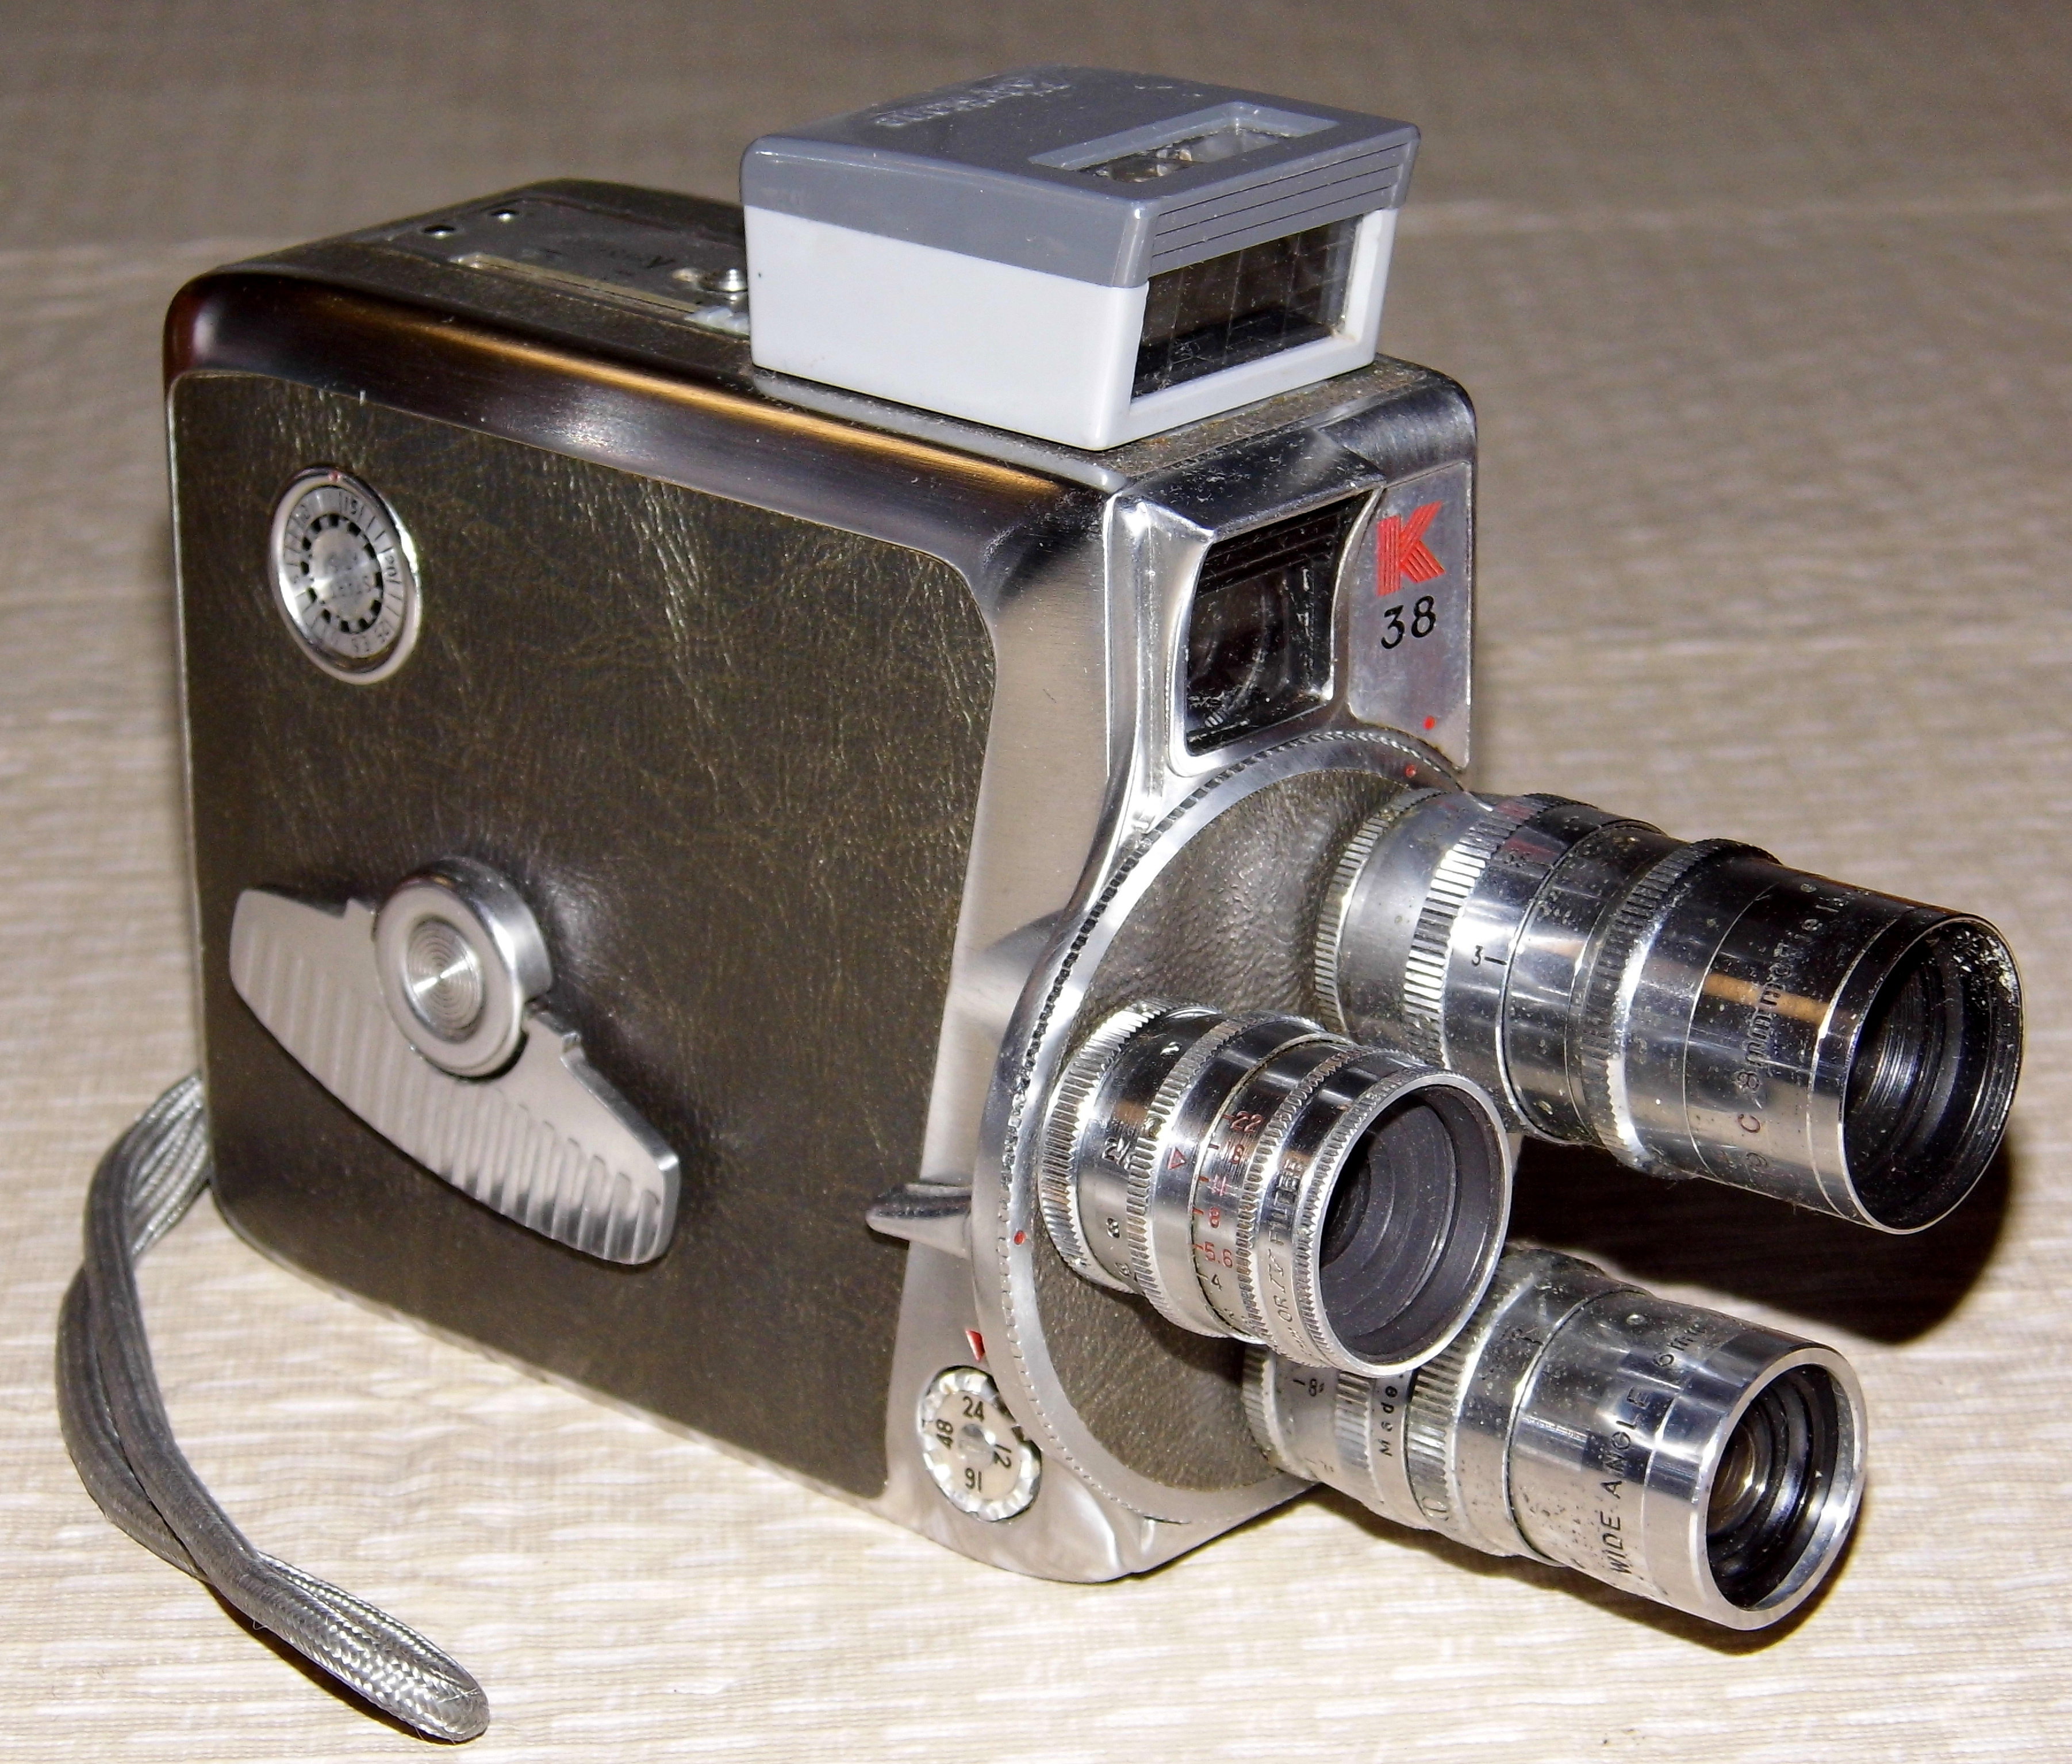 8Mm Vintage Camera file:vintage keystone 8mm turret movie camera, model k38